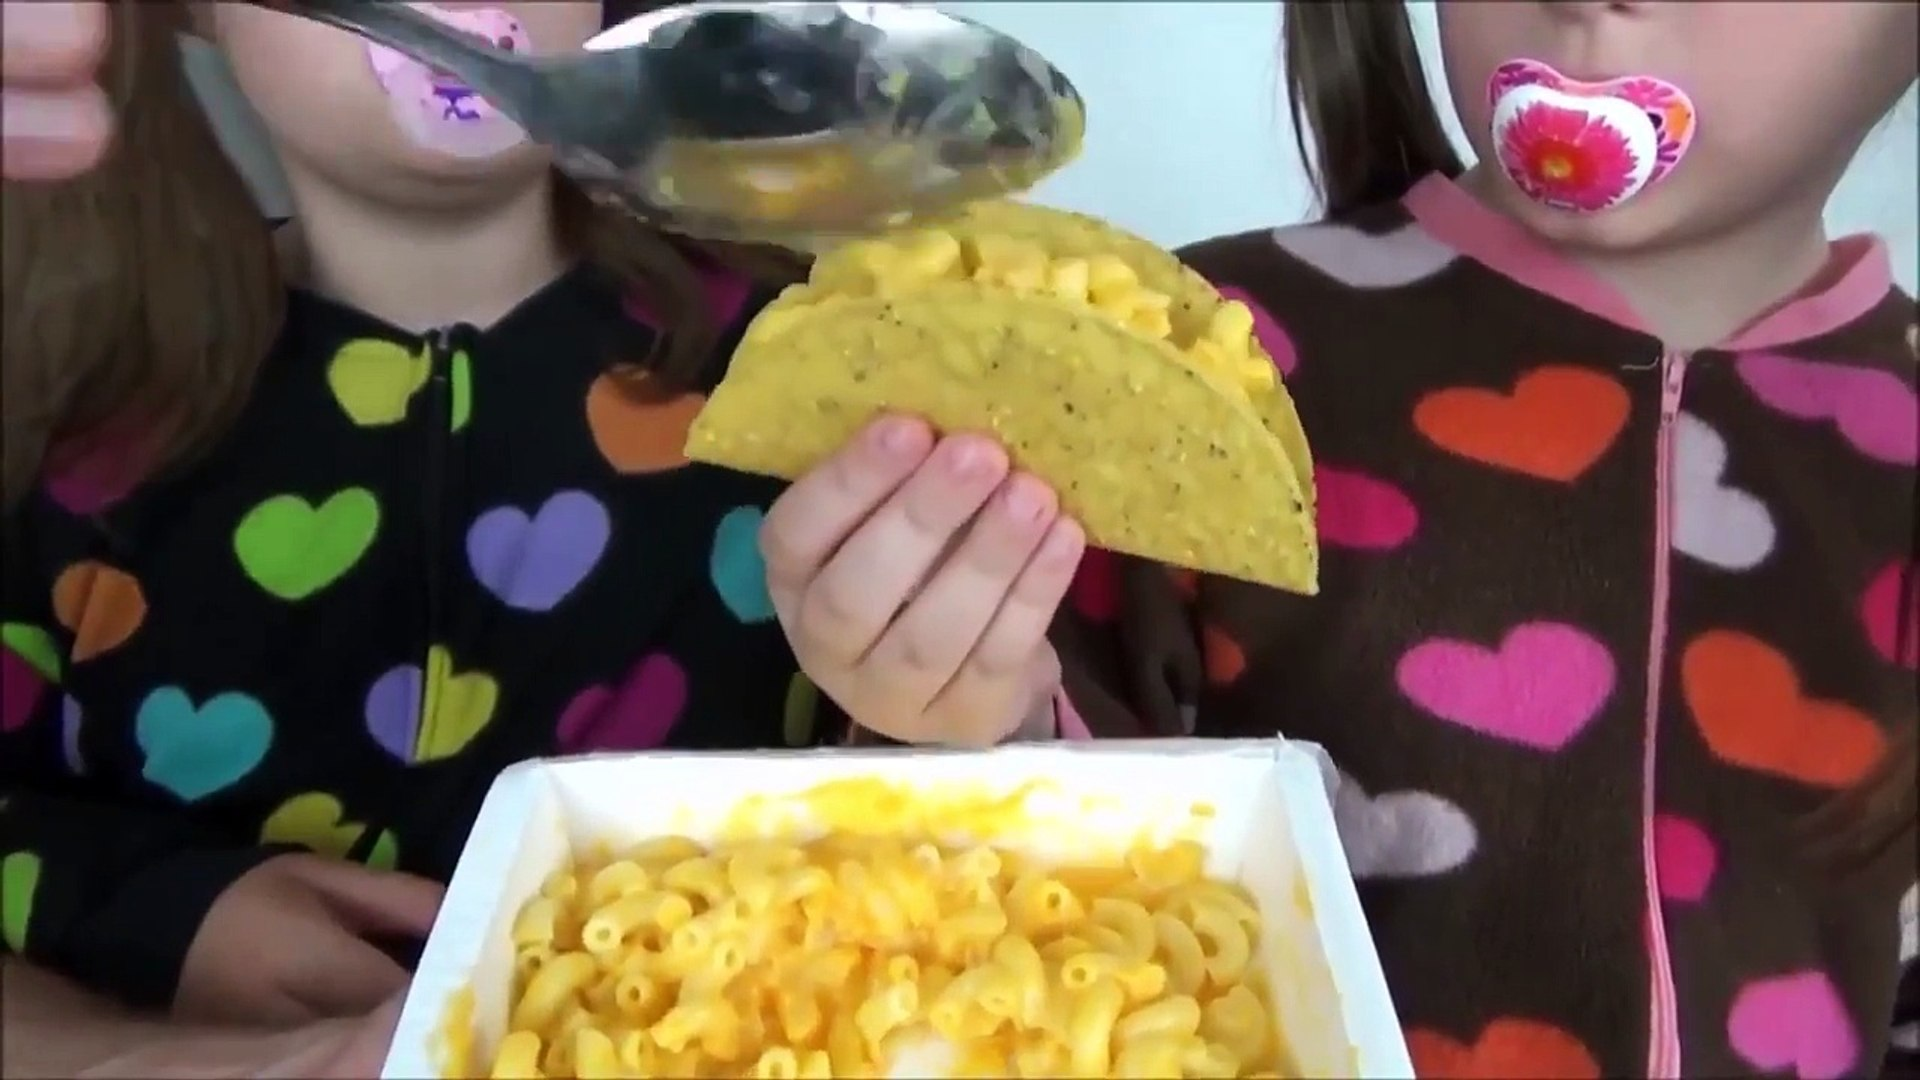 Toy Freaks - Freak Family Vlogs - Bad Baby Taco Challenge Taste Test Spaghetti Pizza Hot Dog Tacos F